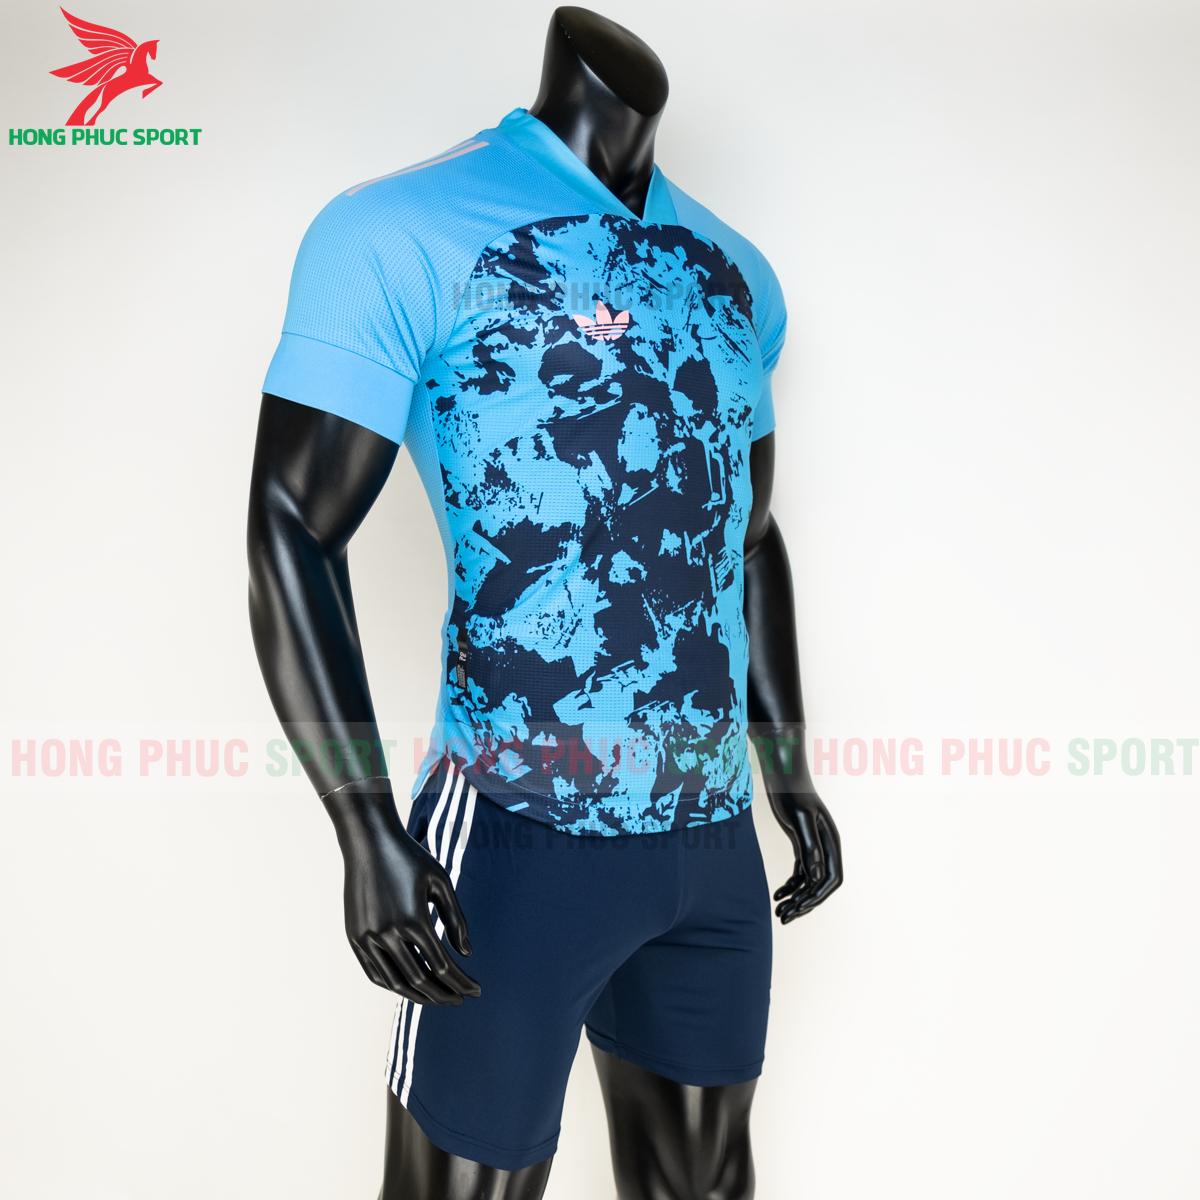 https://cdn.hongphucsport.com/unsafe/s4.shopbay.vn/files/285/ao-bong-da-condivo-template-20-21-hang-thailand-mau5-6-5fae5508e264a.png